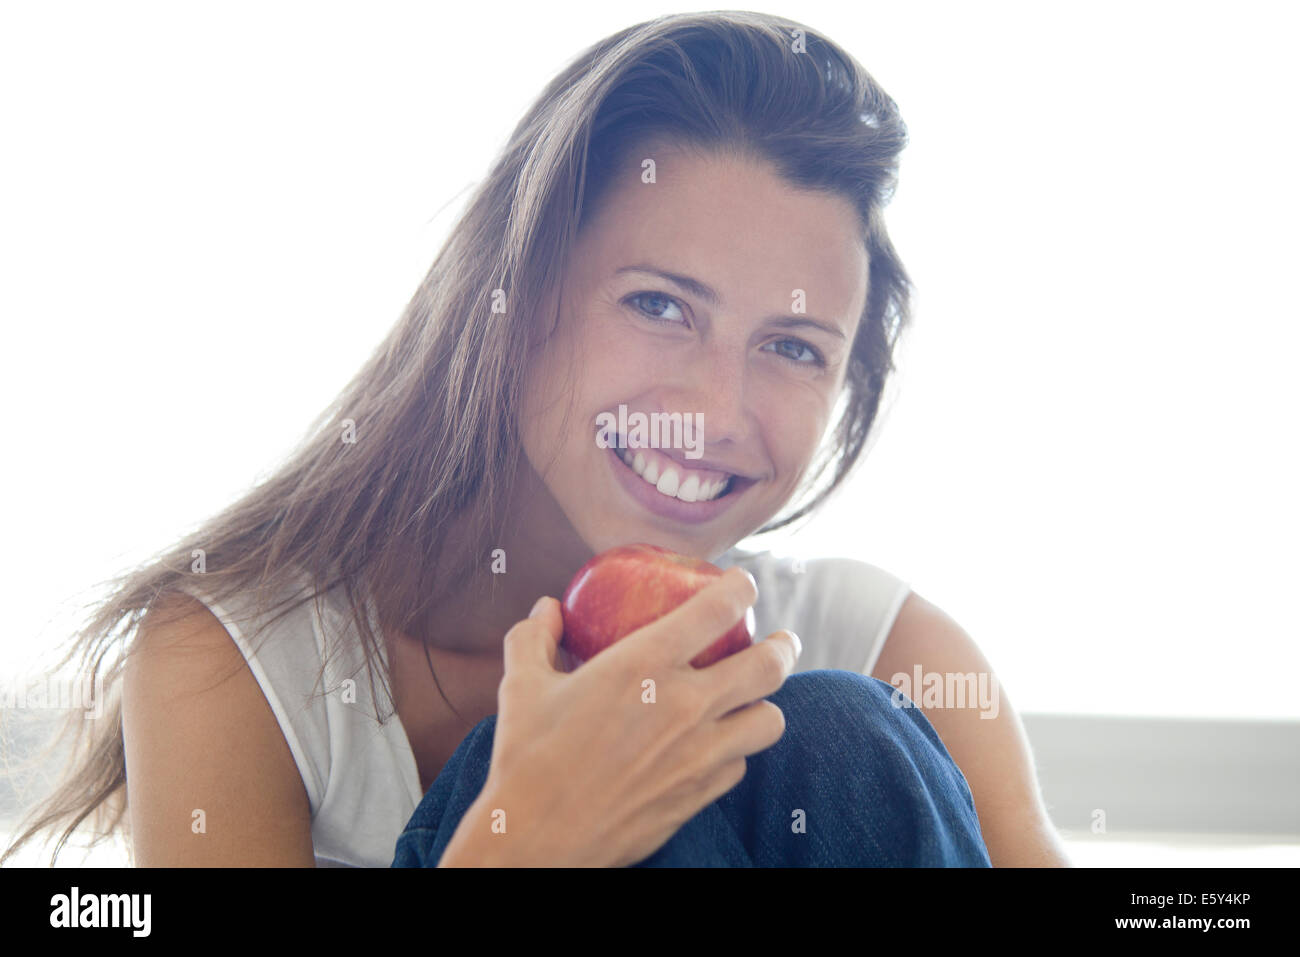 Woman holding apple, smiling, portrait - Stock Image